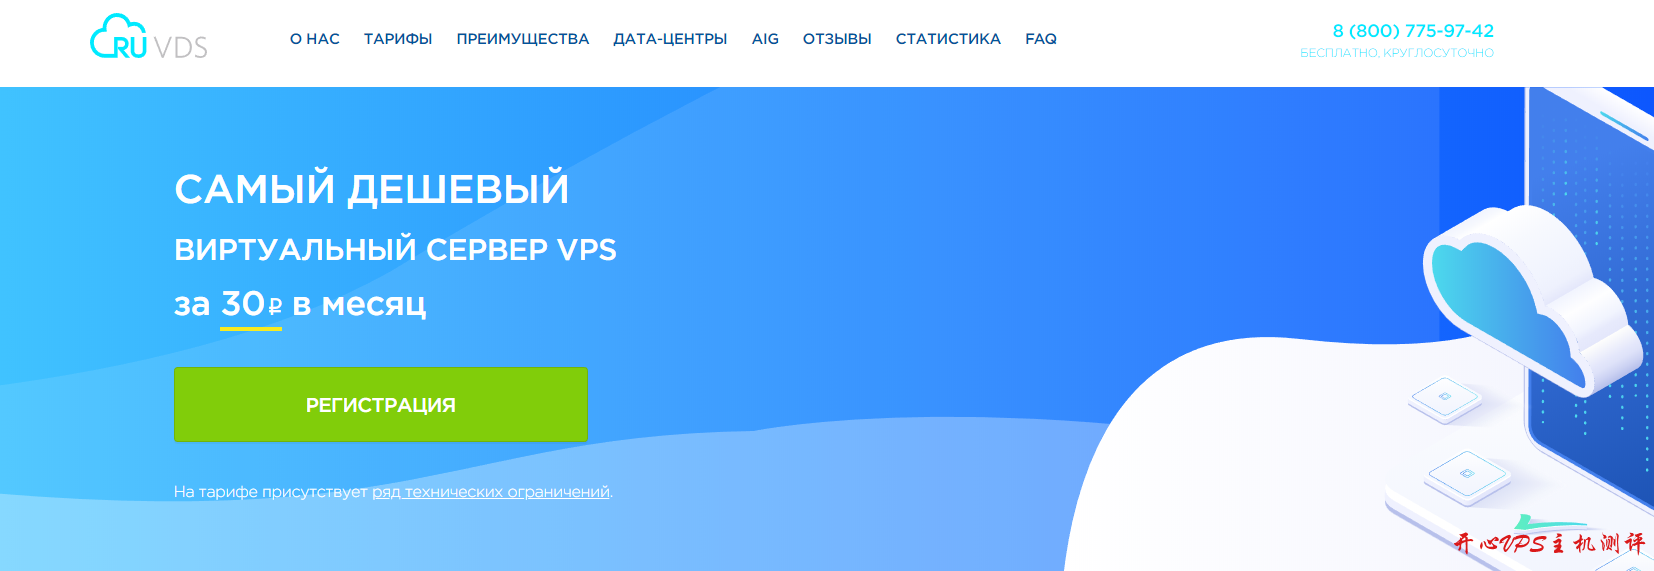 RUVDS:30卢布/月-512MB/10GB/无限流量/俄罗斯-国外主机测评